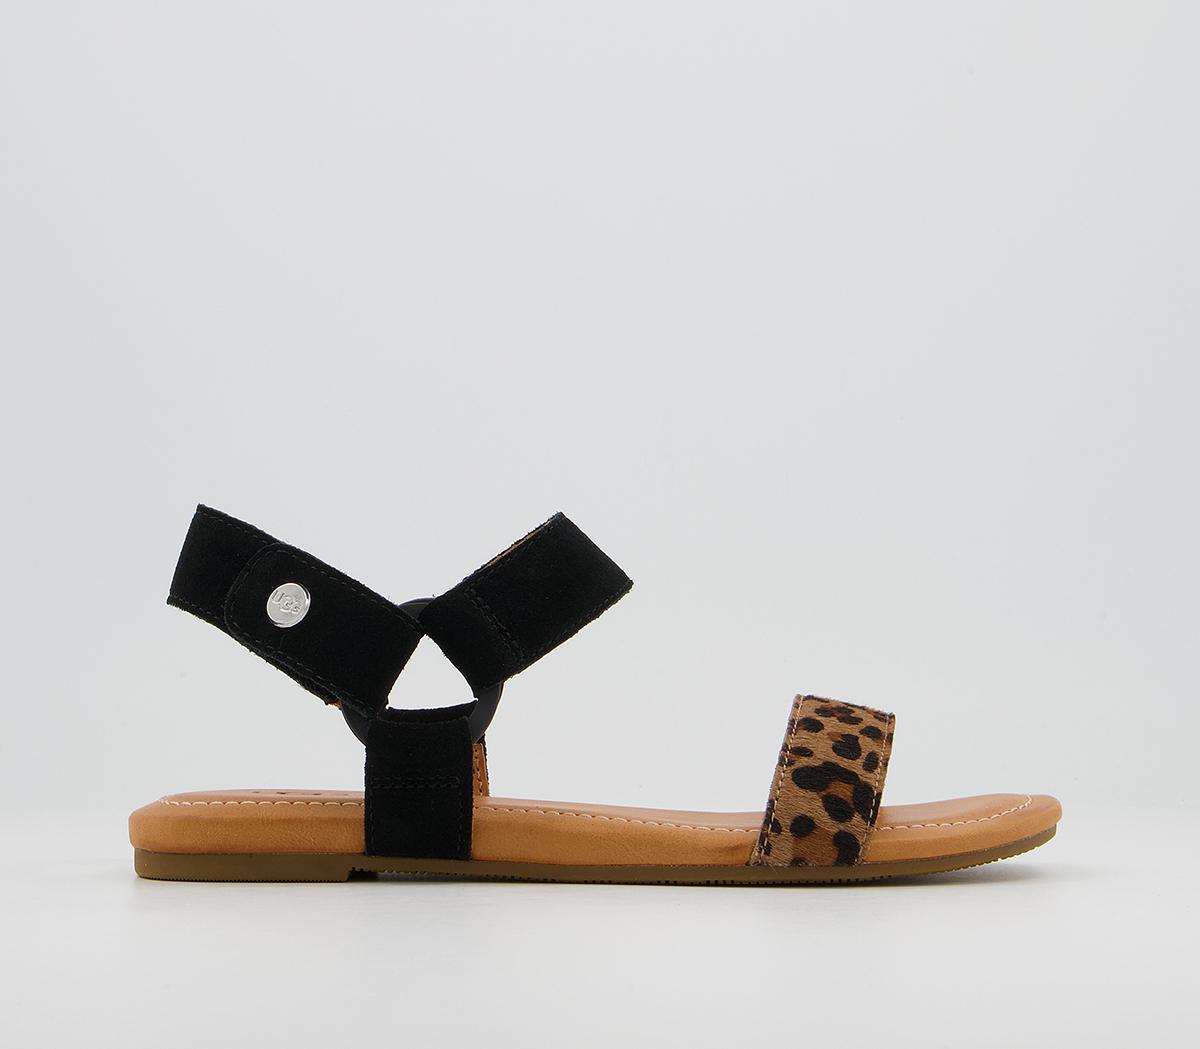 Rynell Sandals